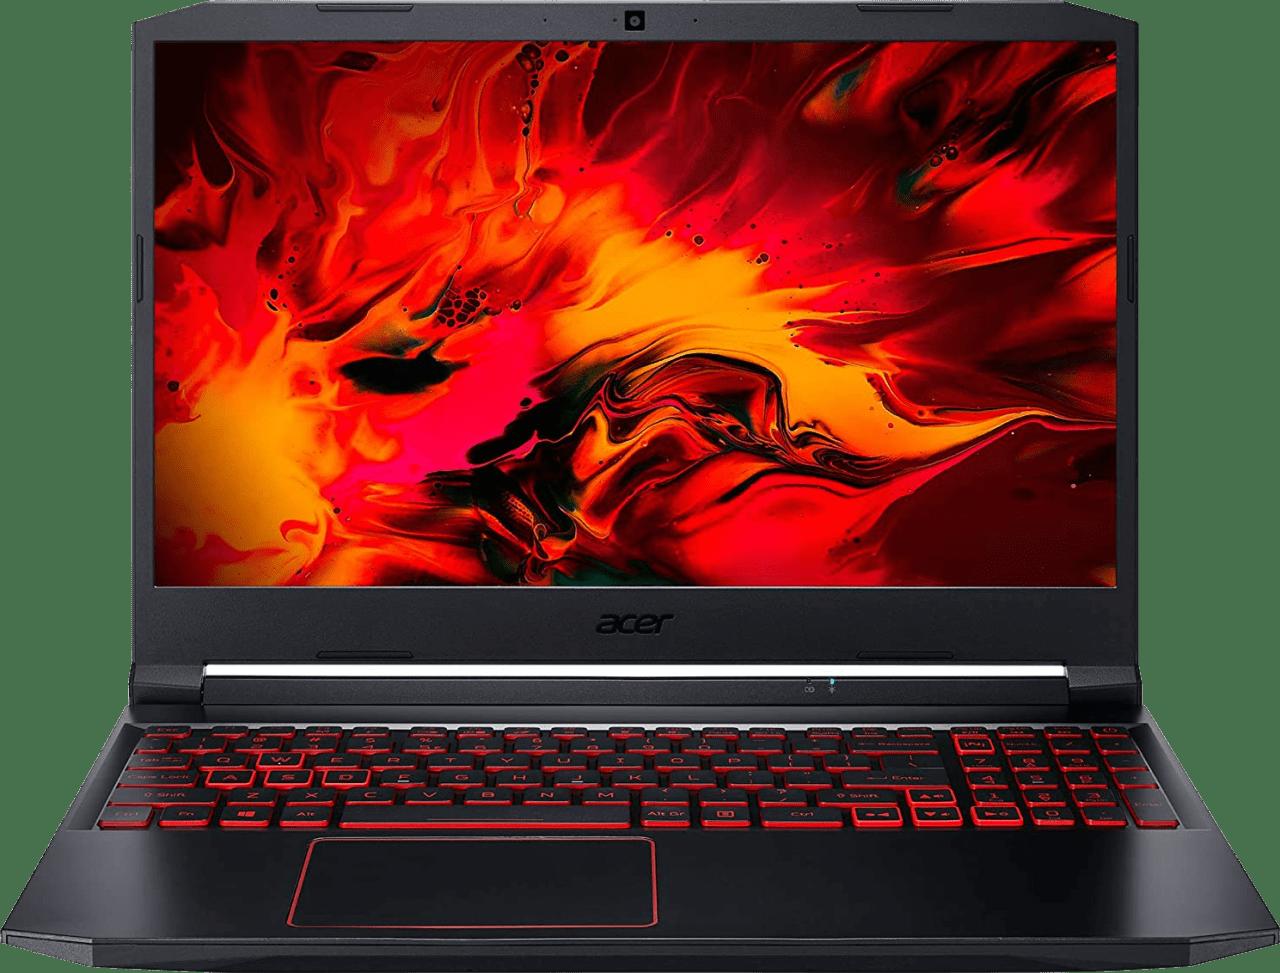 Schwarz / Rot Acer Nitro 5 AN517-52-7454 - Gaming Notebook - Intel® Core™ i7-10750H - 16GB - 512GB SSD - NVIDIA® GeForce® RTX 3050 Ti (4GB).1